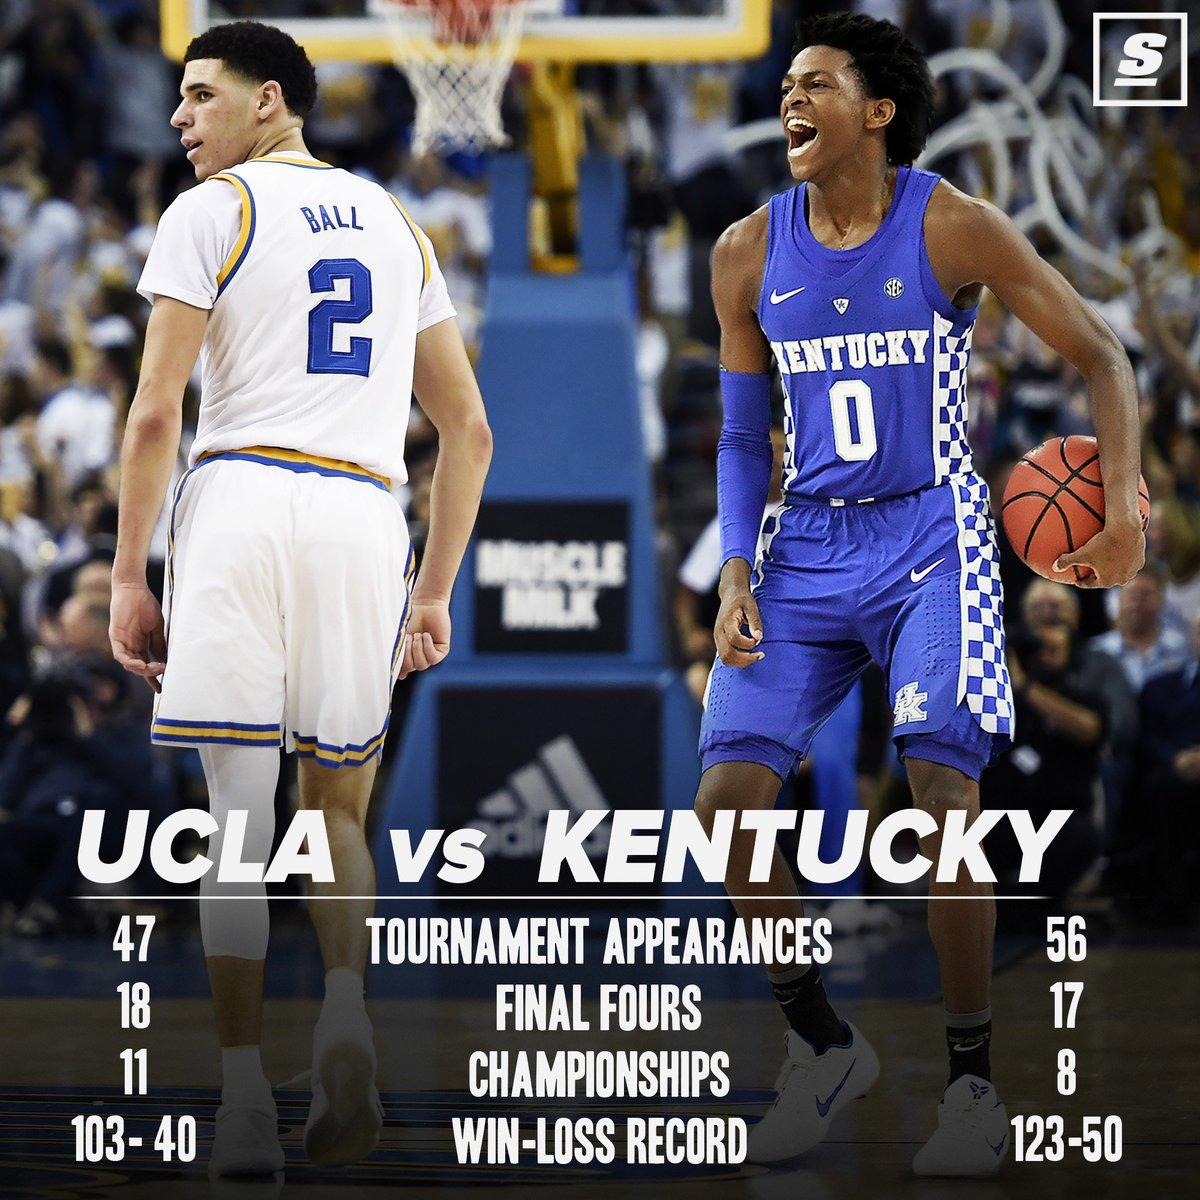 UCLA vs. Kentucky promises to be 🔥. #Sweet16 https://t.co/ti8vRwPVlq